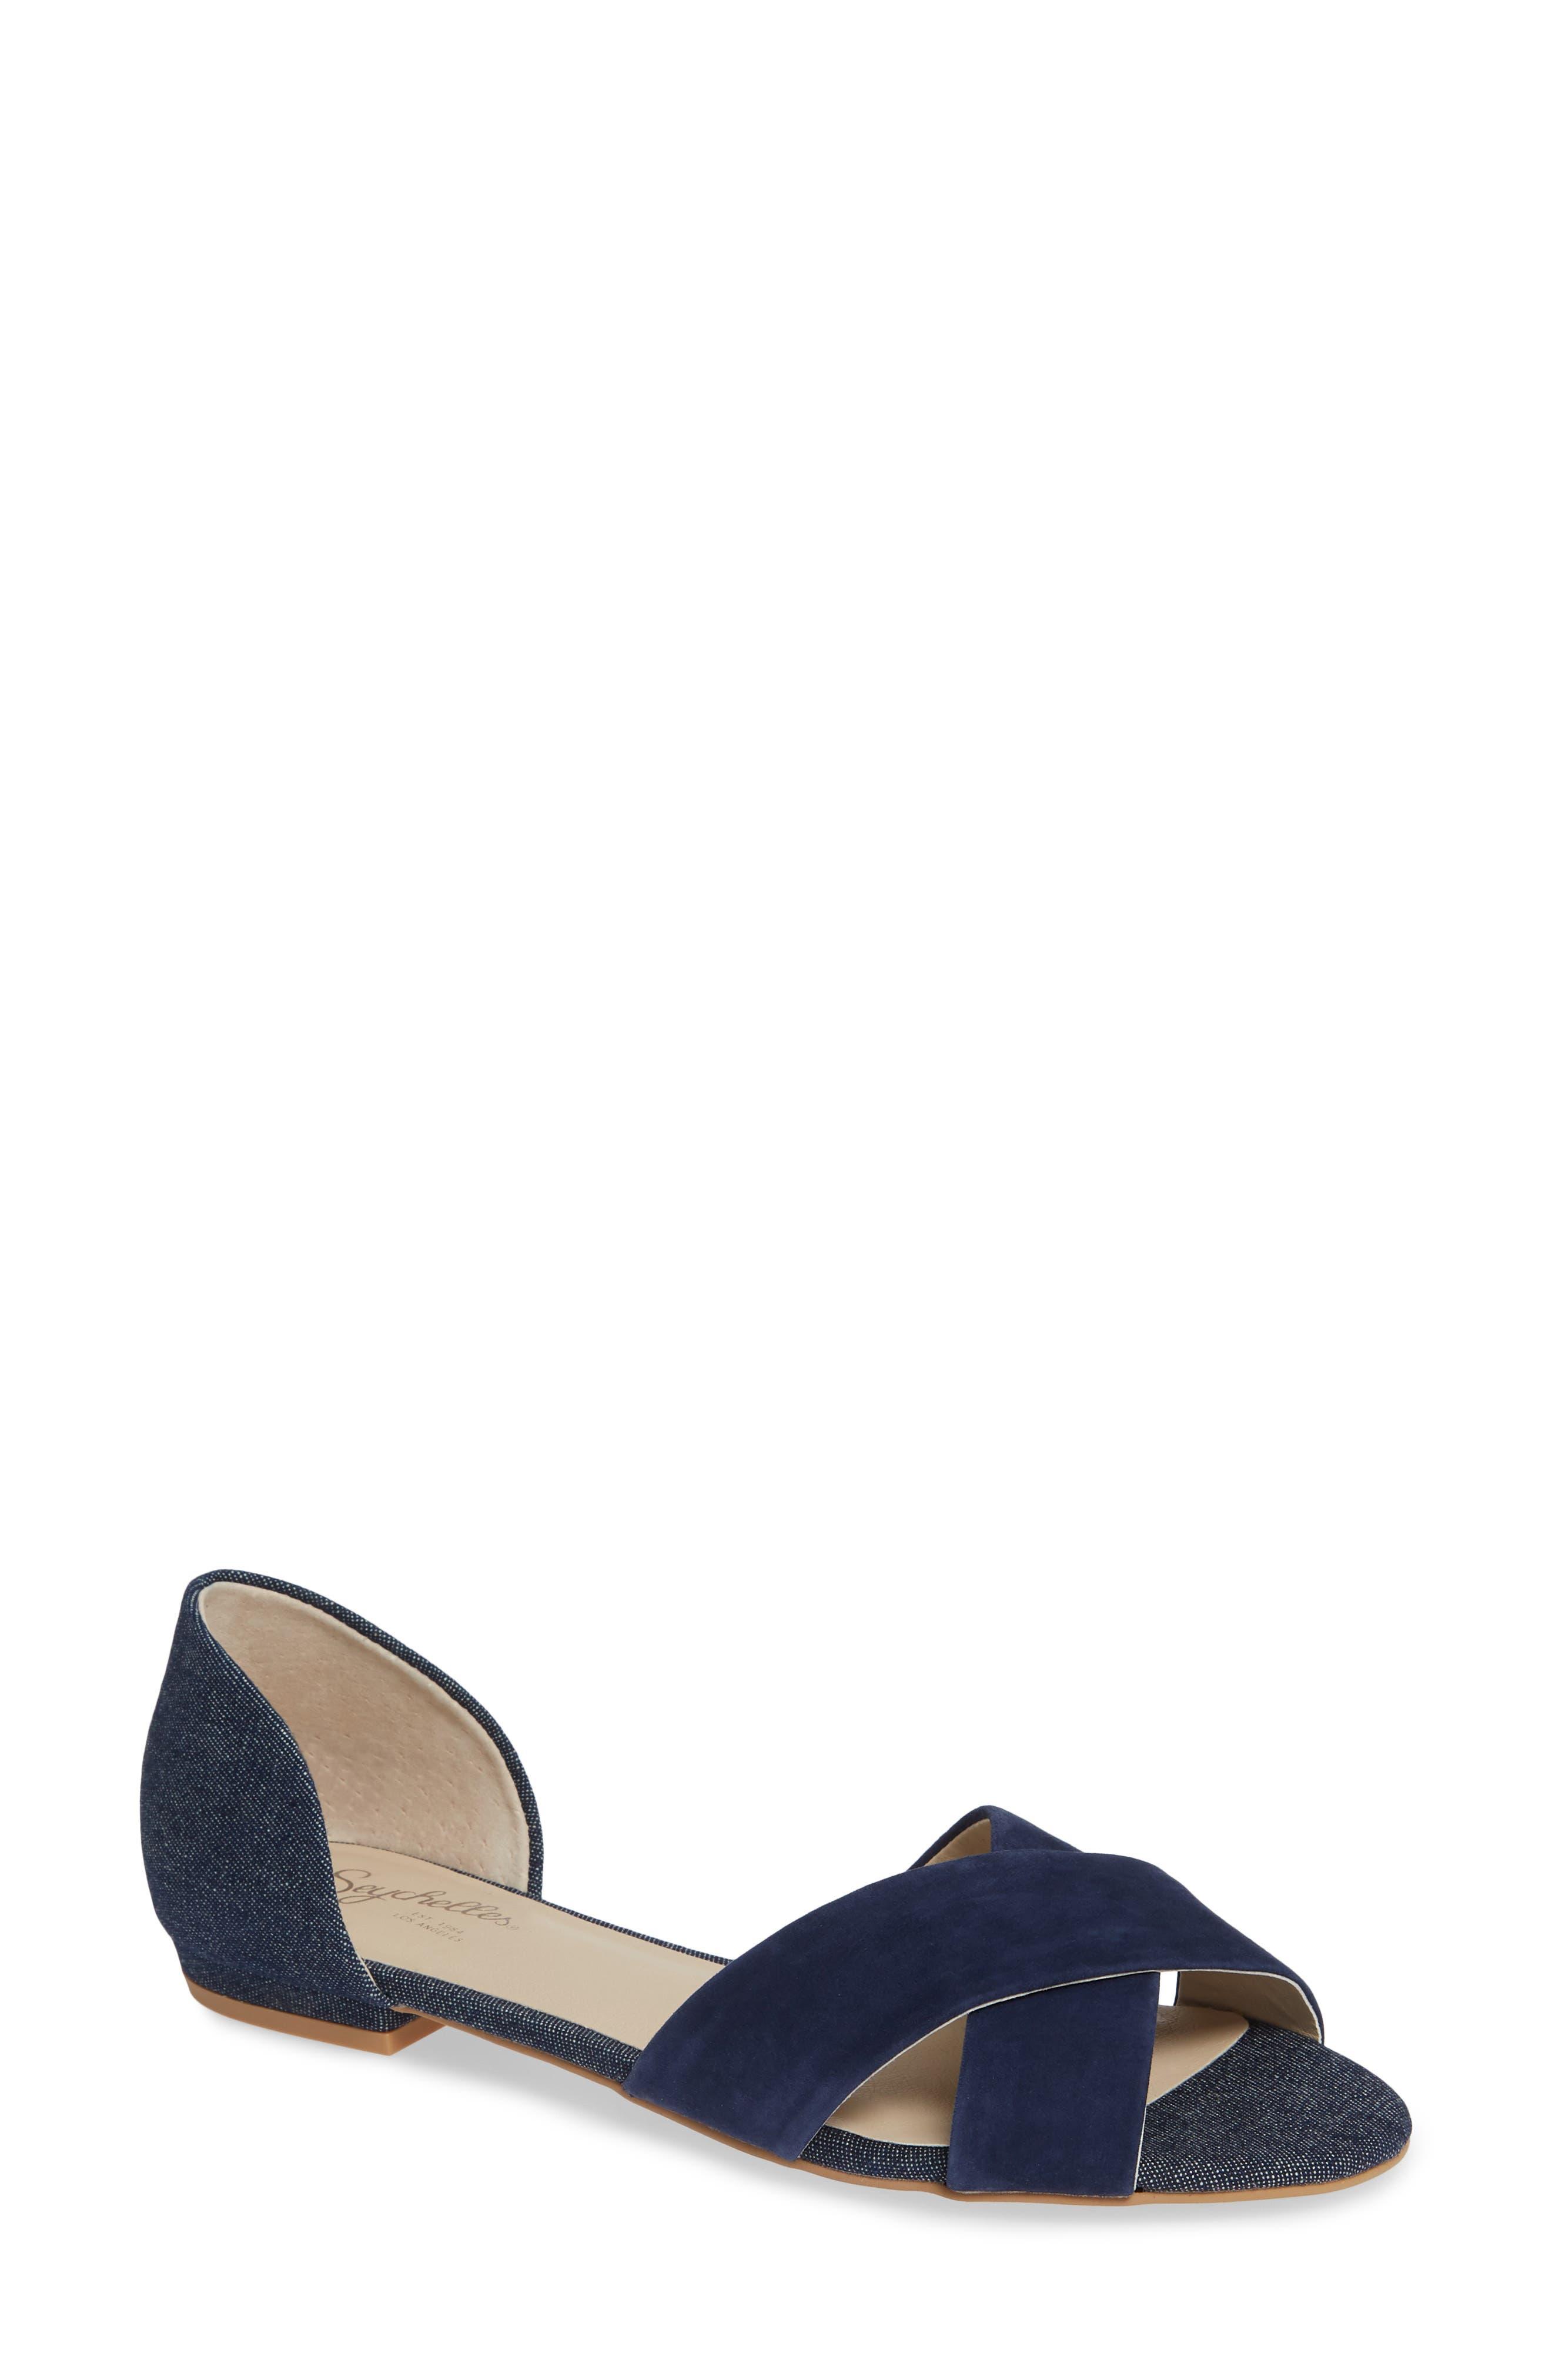 Slow Down Sandal,                         Main,                         color, NAVY SUEDE